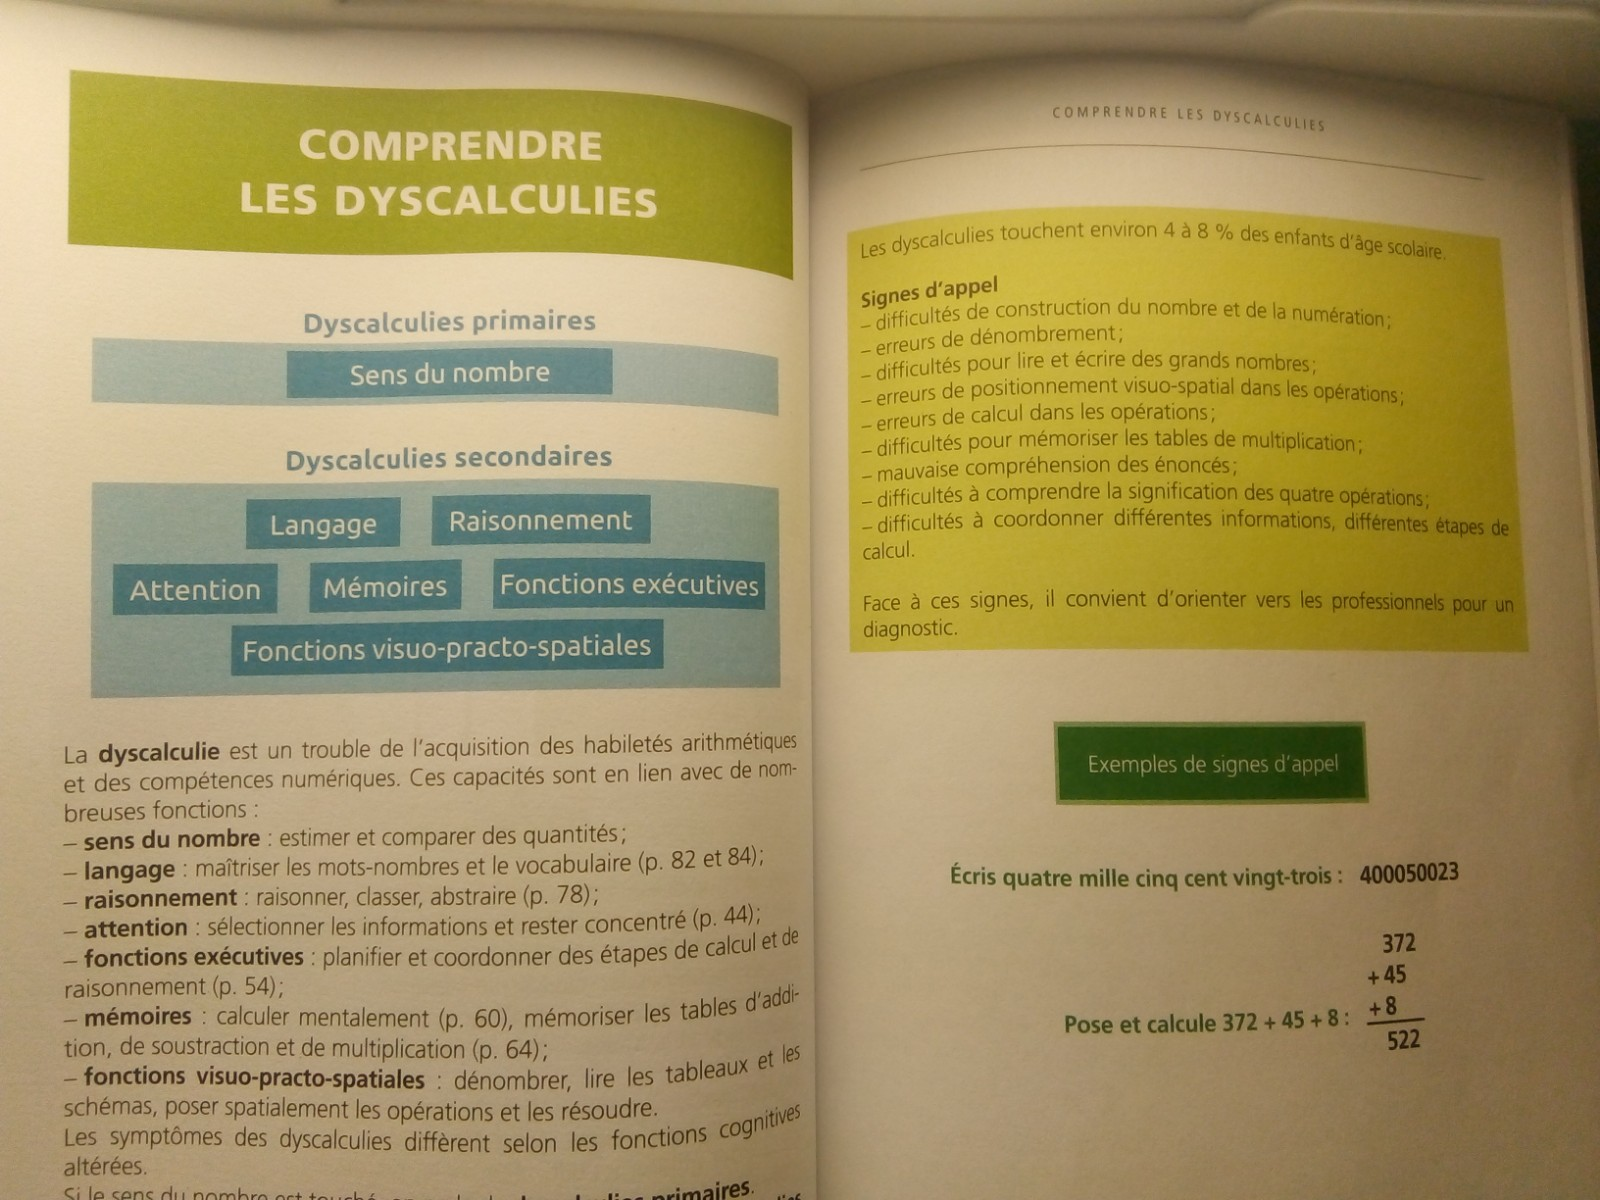 Neuropsychologie dys